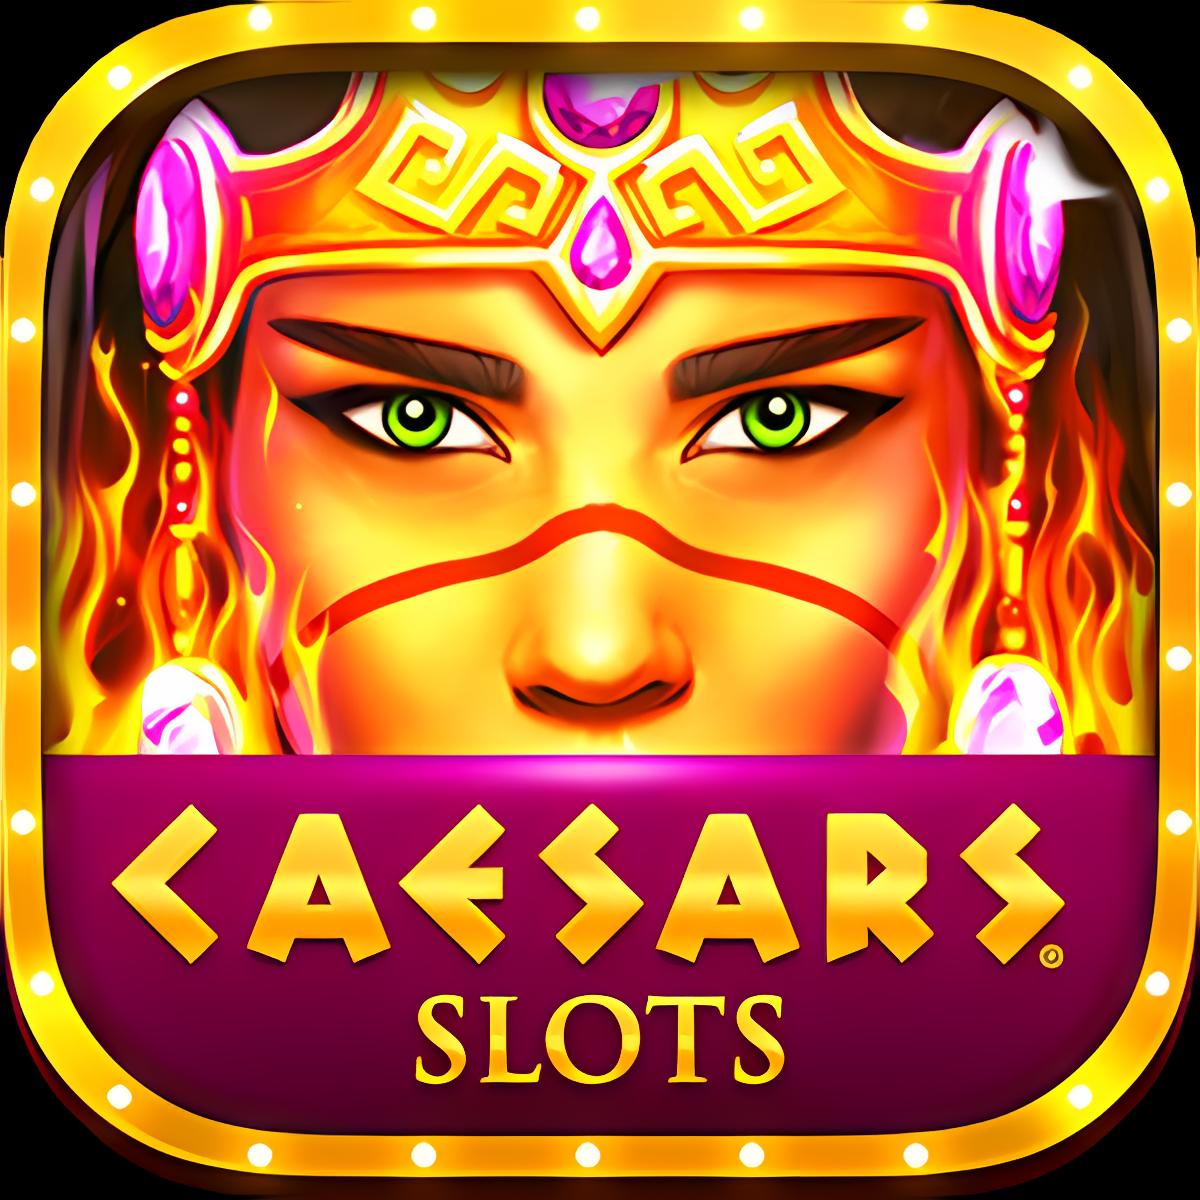 Caesars Slots Casino gratis